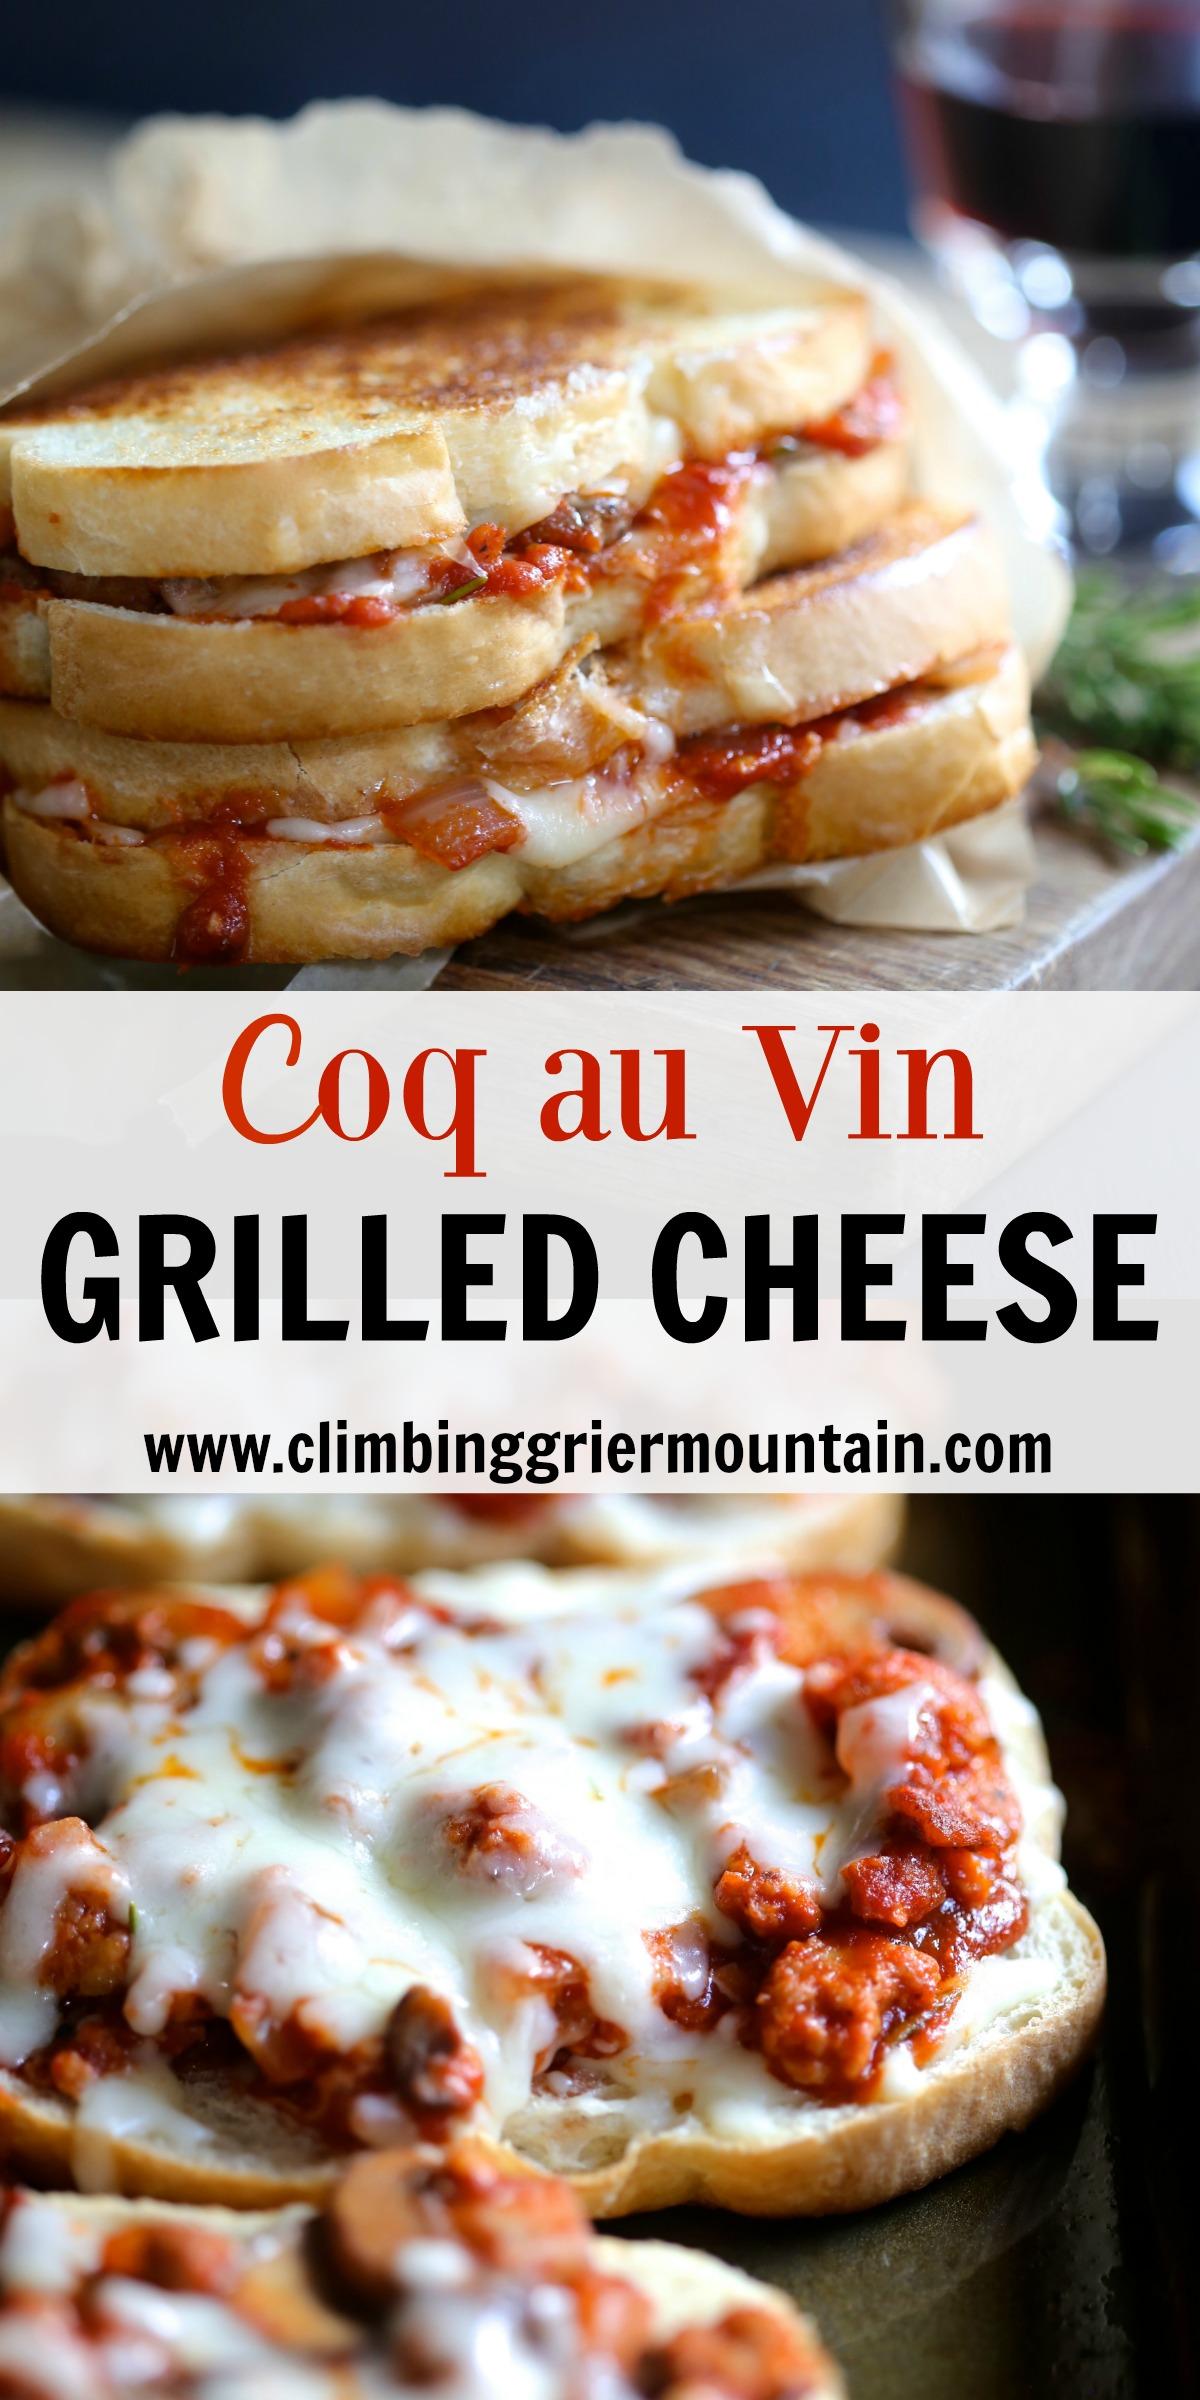 coq au vin grilled cheese II www.climbinggriermountain.com